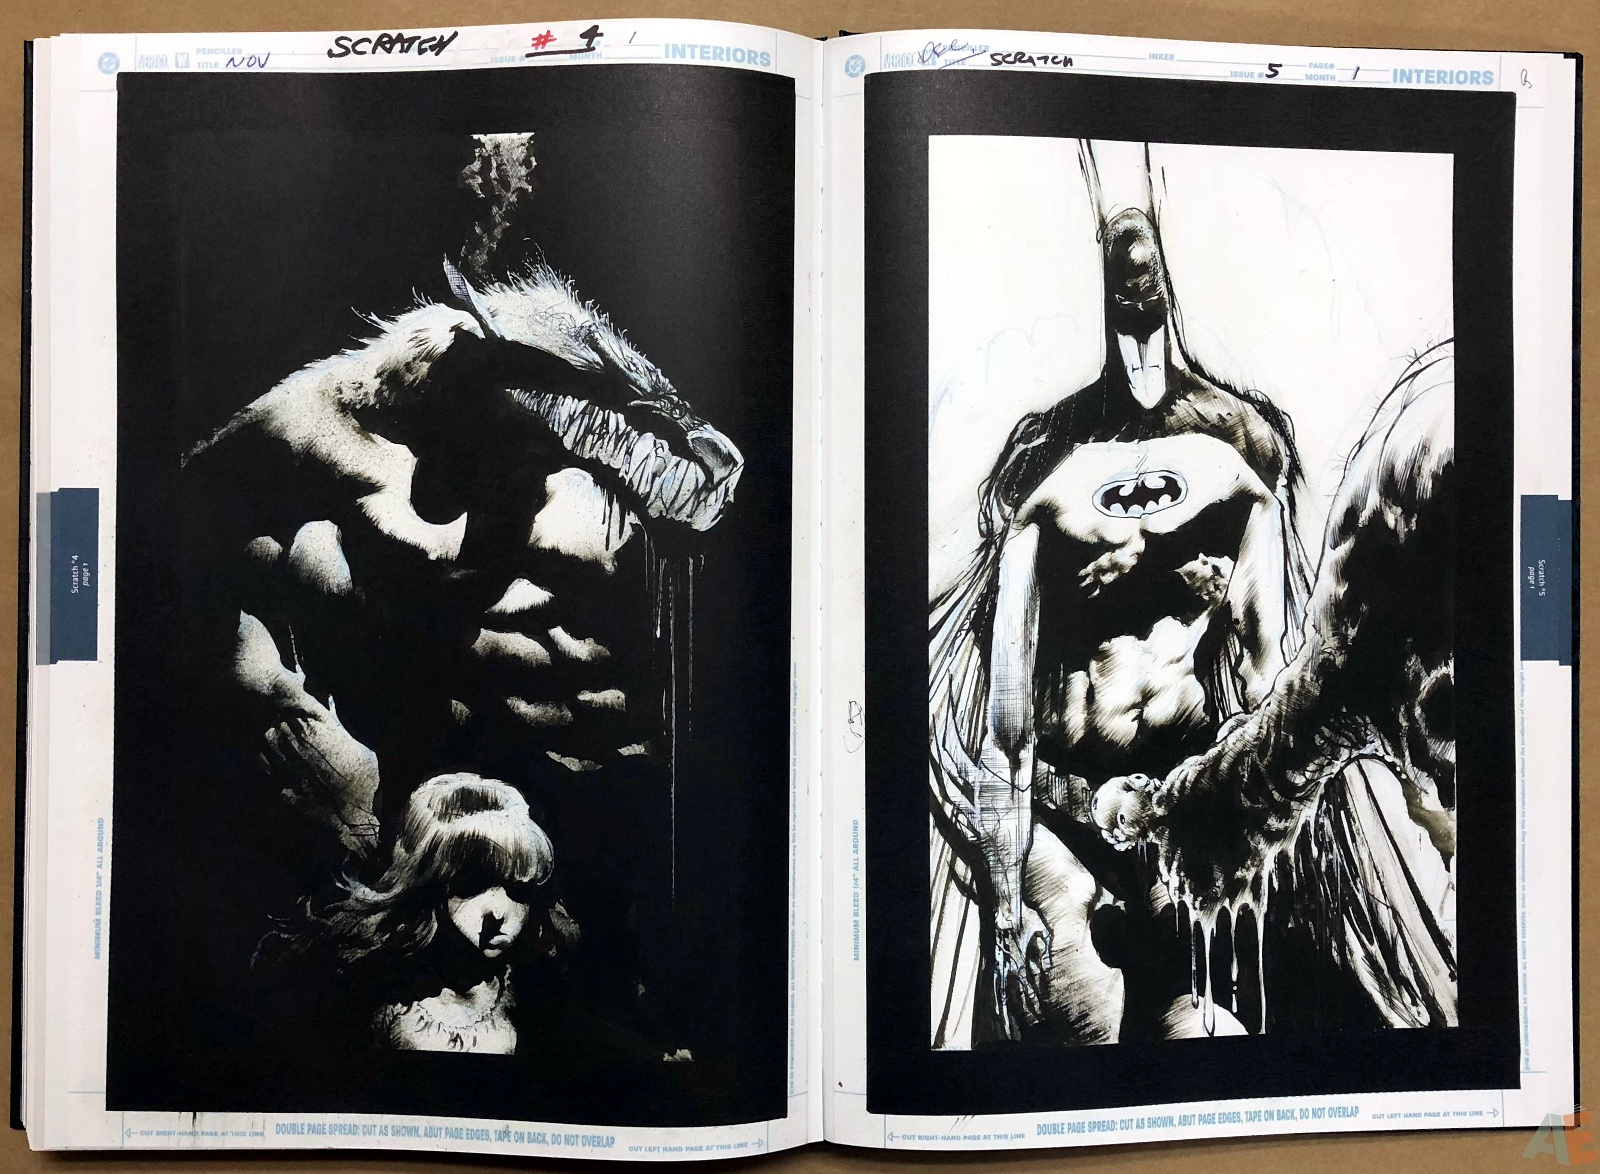 Batman: Secrets – Sam Kieth Gallery Edition 51